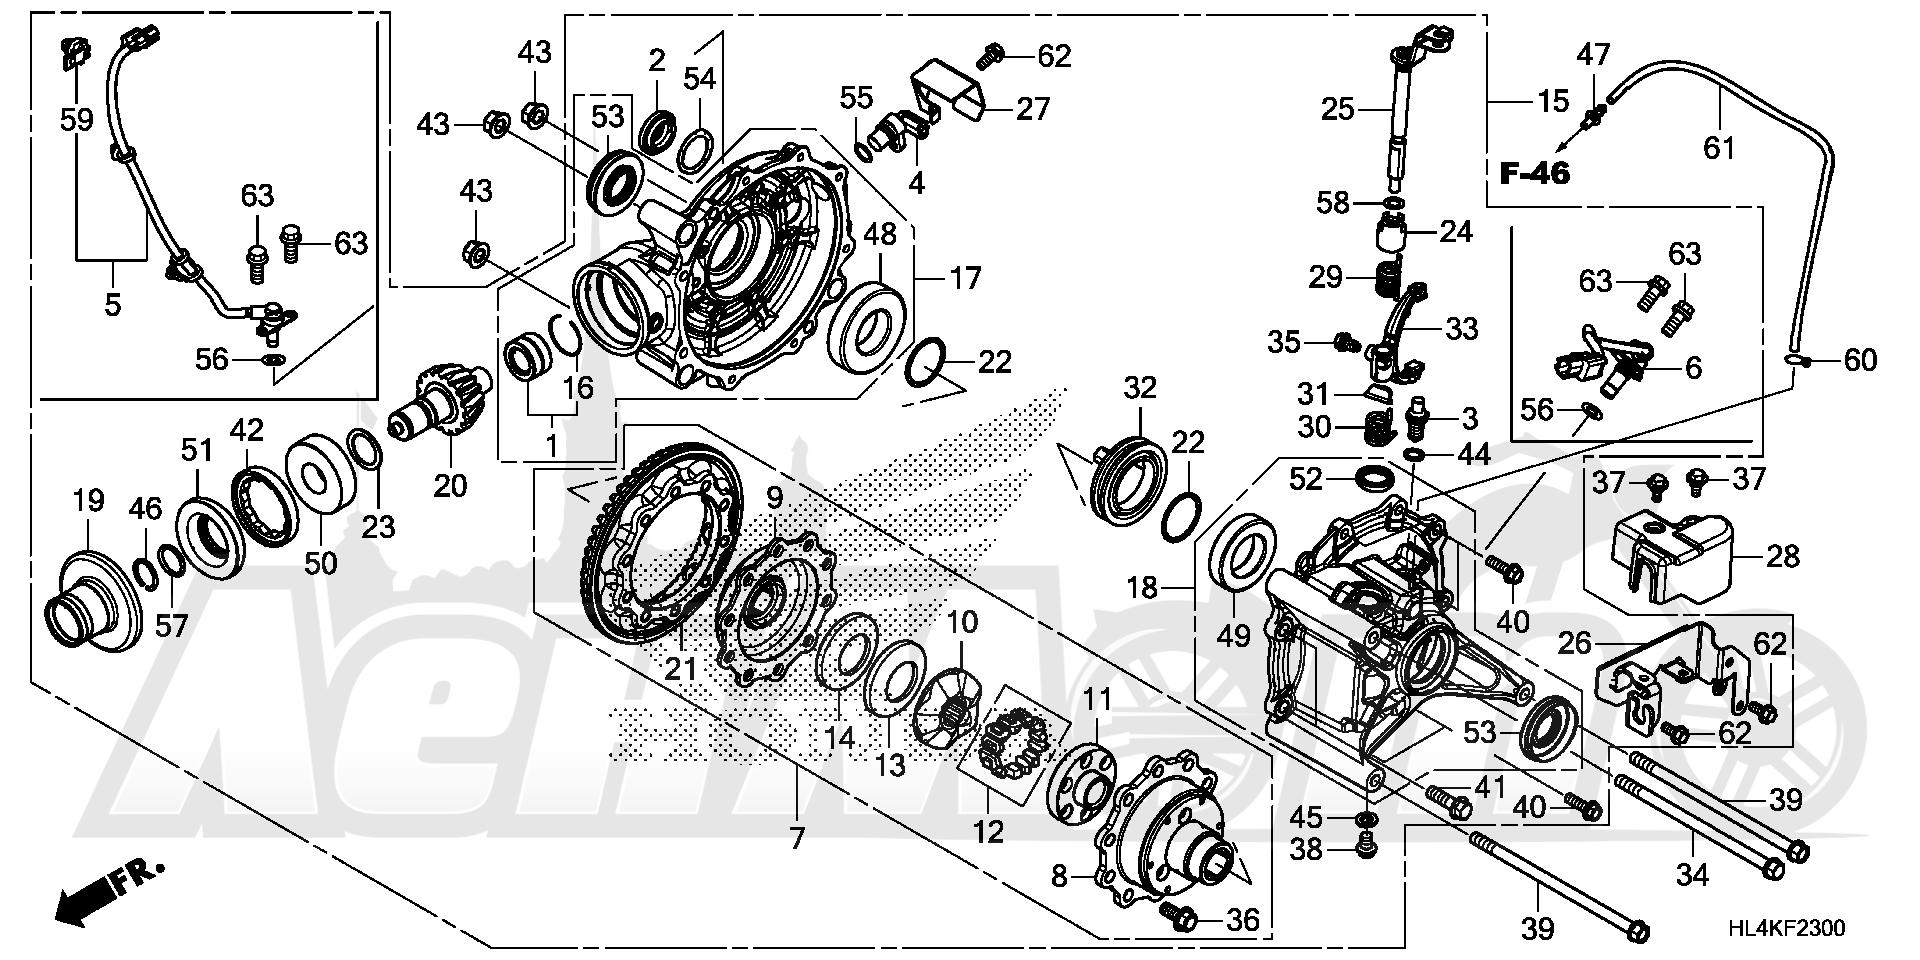 Запчасти для Квадроцикла Honda 2019 SXS1000M3L Раздел: FINAL DRIVEN GEAR   FINAL ведомый шестерня